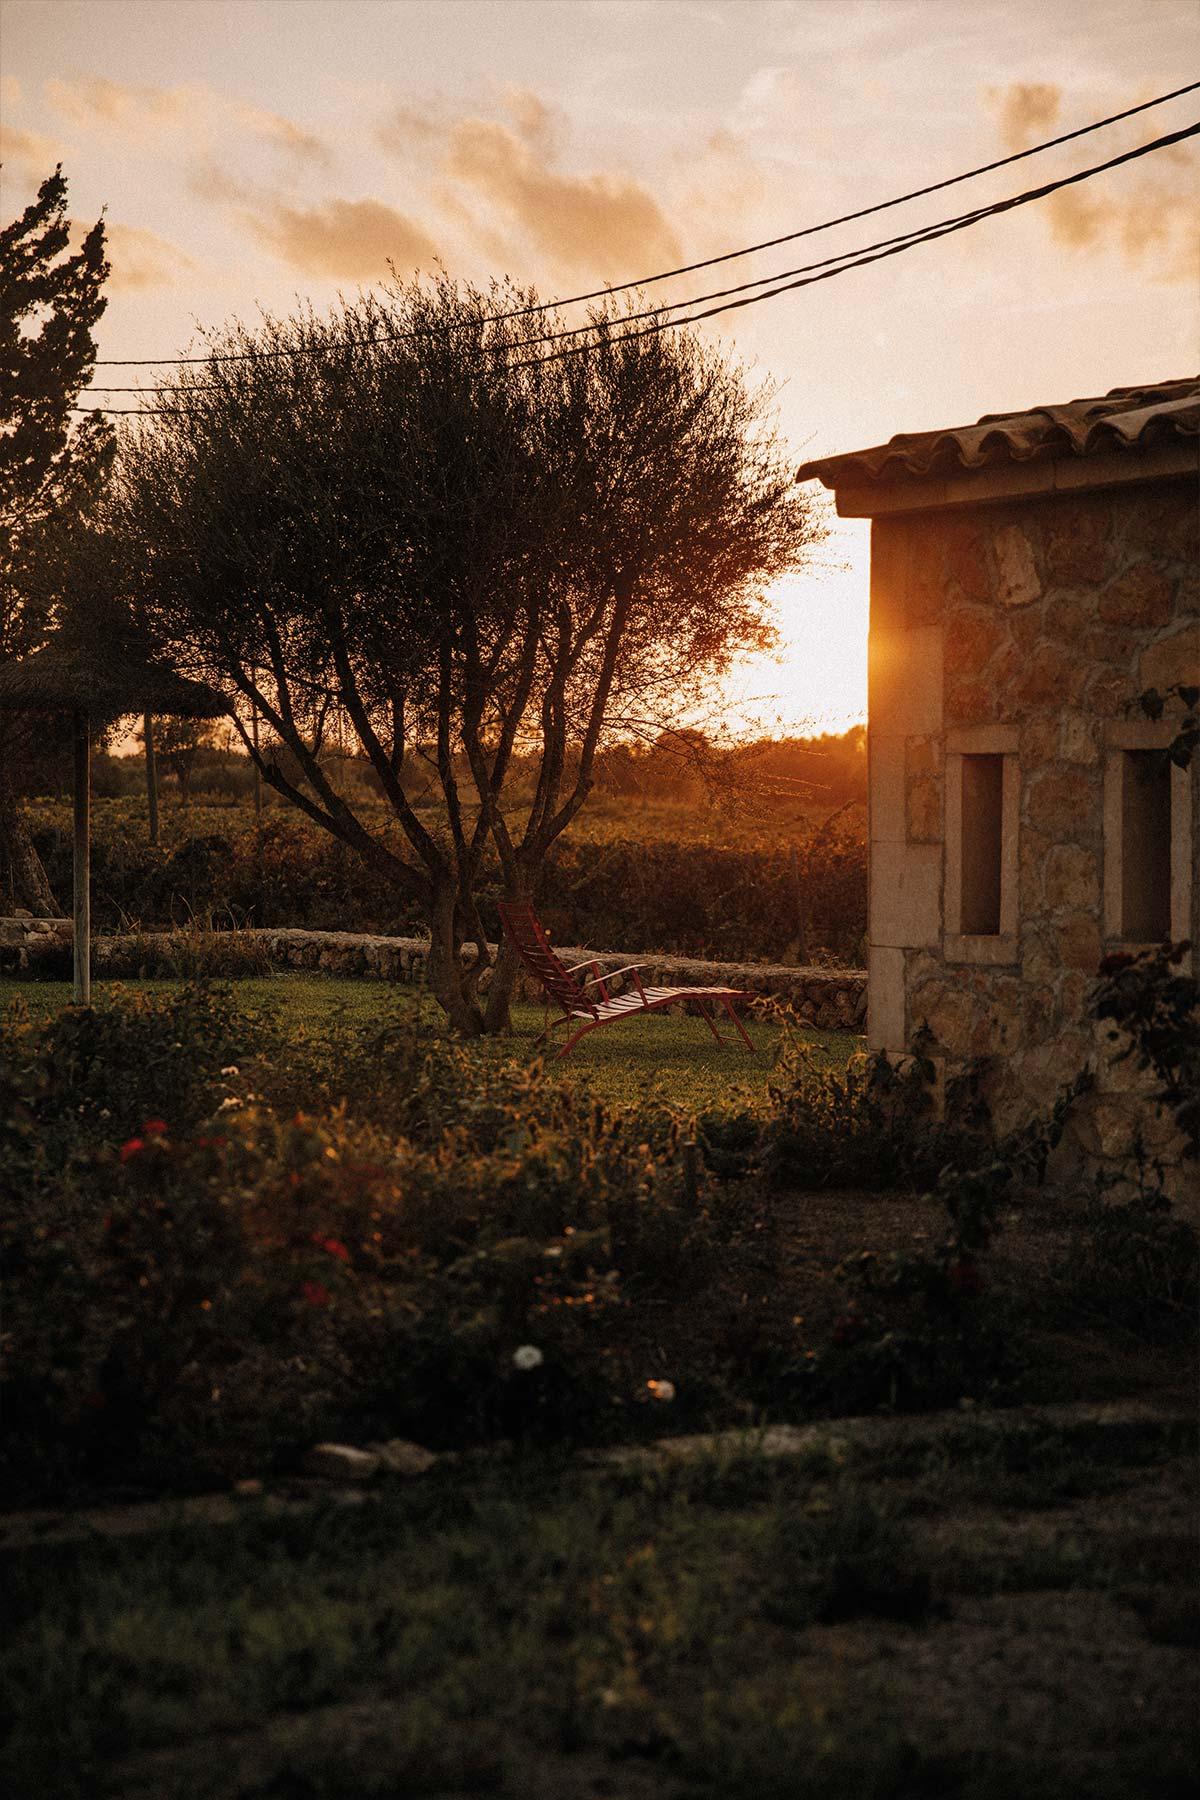 Travel-Photography-Bildreportage-Mallorca-Spain-Vacation-Basti-Kaspar_finca-sundowner